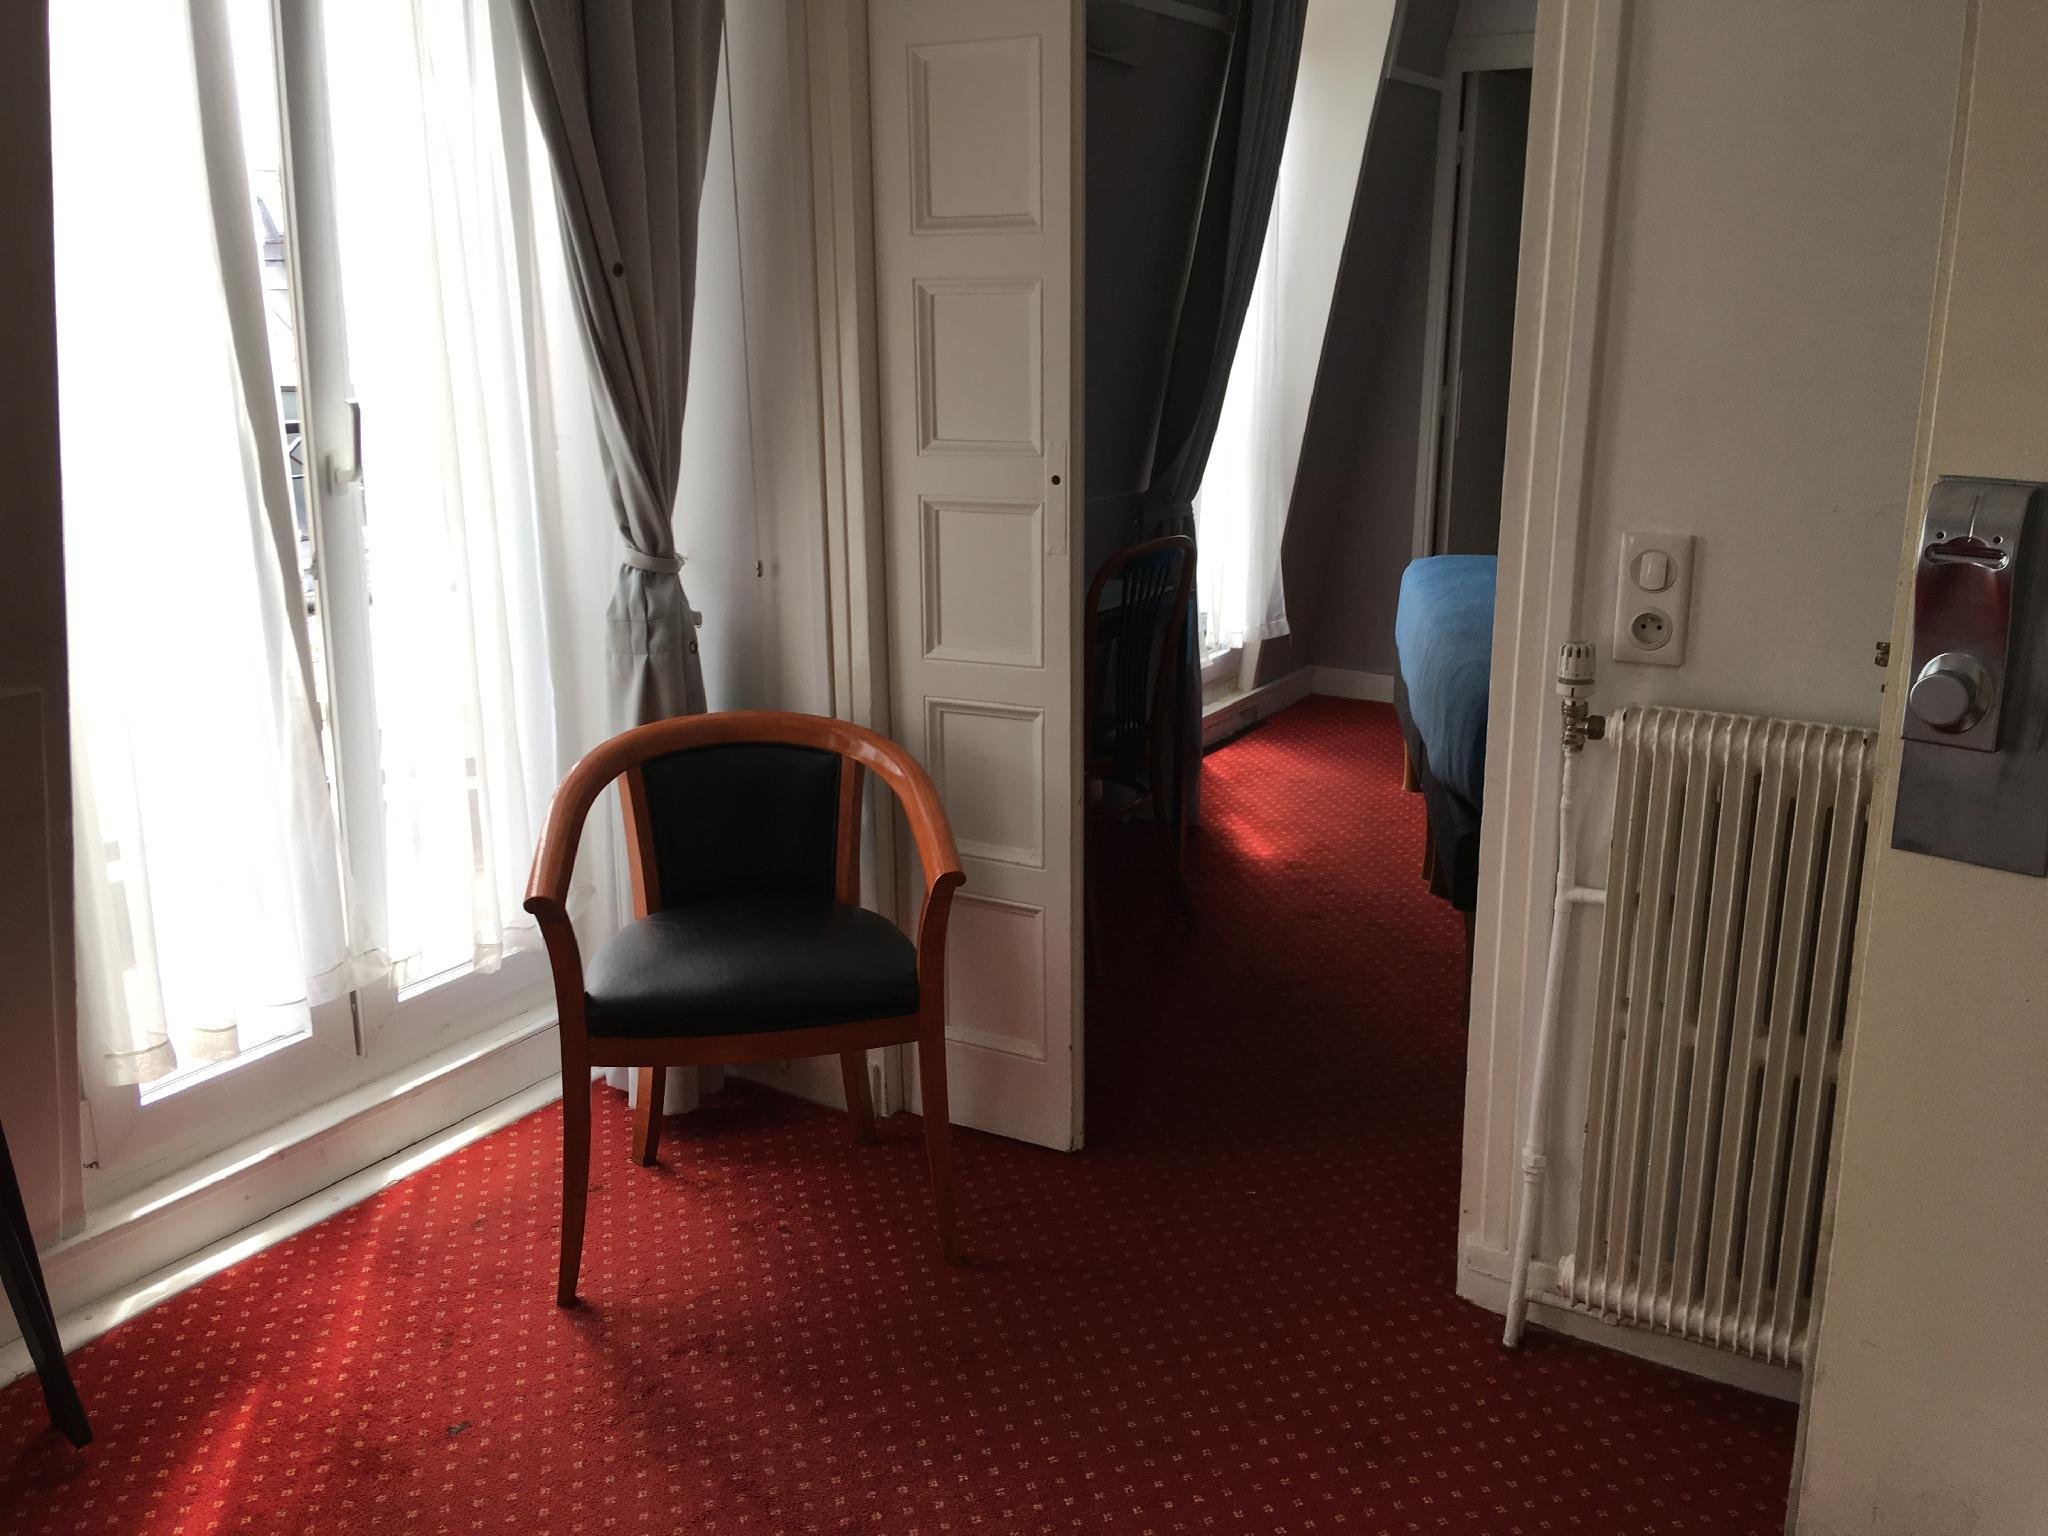 La Louisiane Hotel Heart Of Saint Germain Des Pres